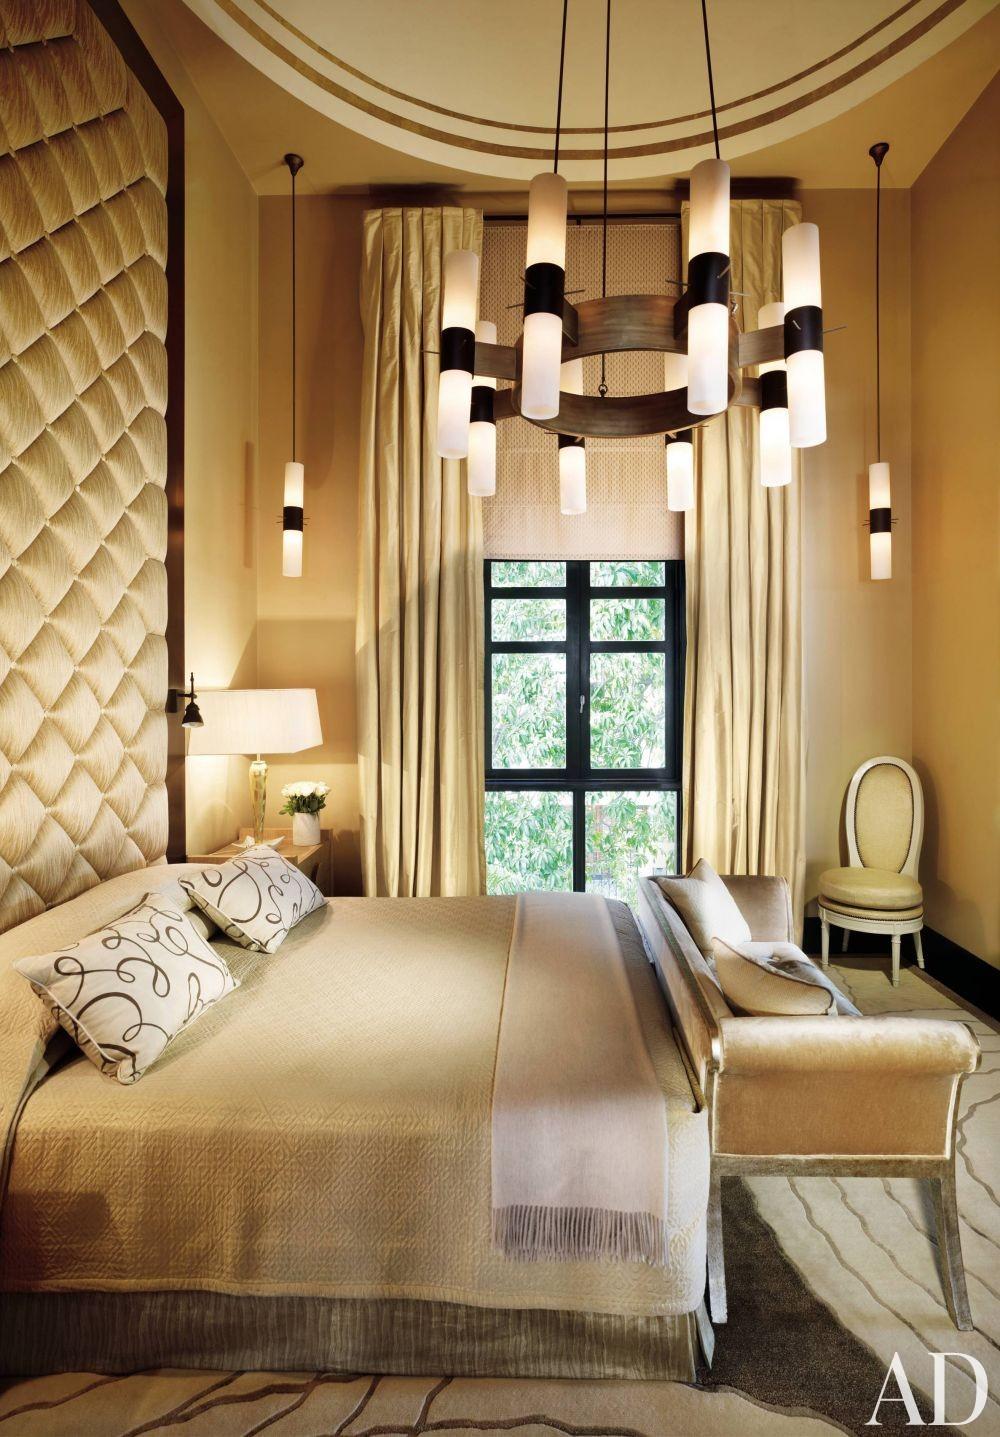 Contemporary Bedroom by Jean-Louis Deniot in New Delhi, India